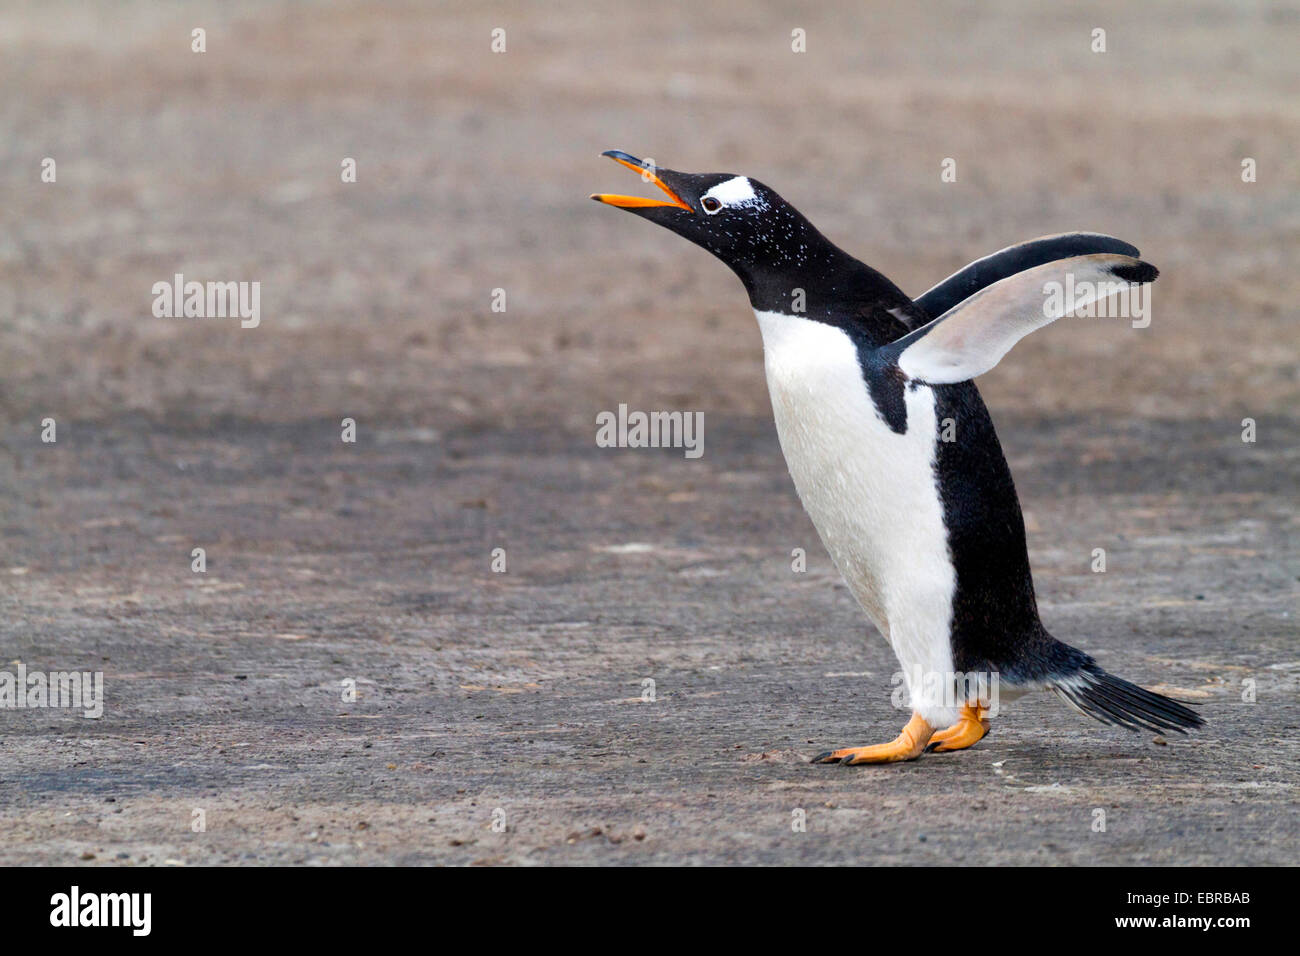 gentoo penguin (Pygoscelis papua), flapping wings and calling, Antarctica, Falkland Islands - Stock Image